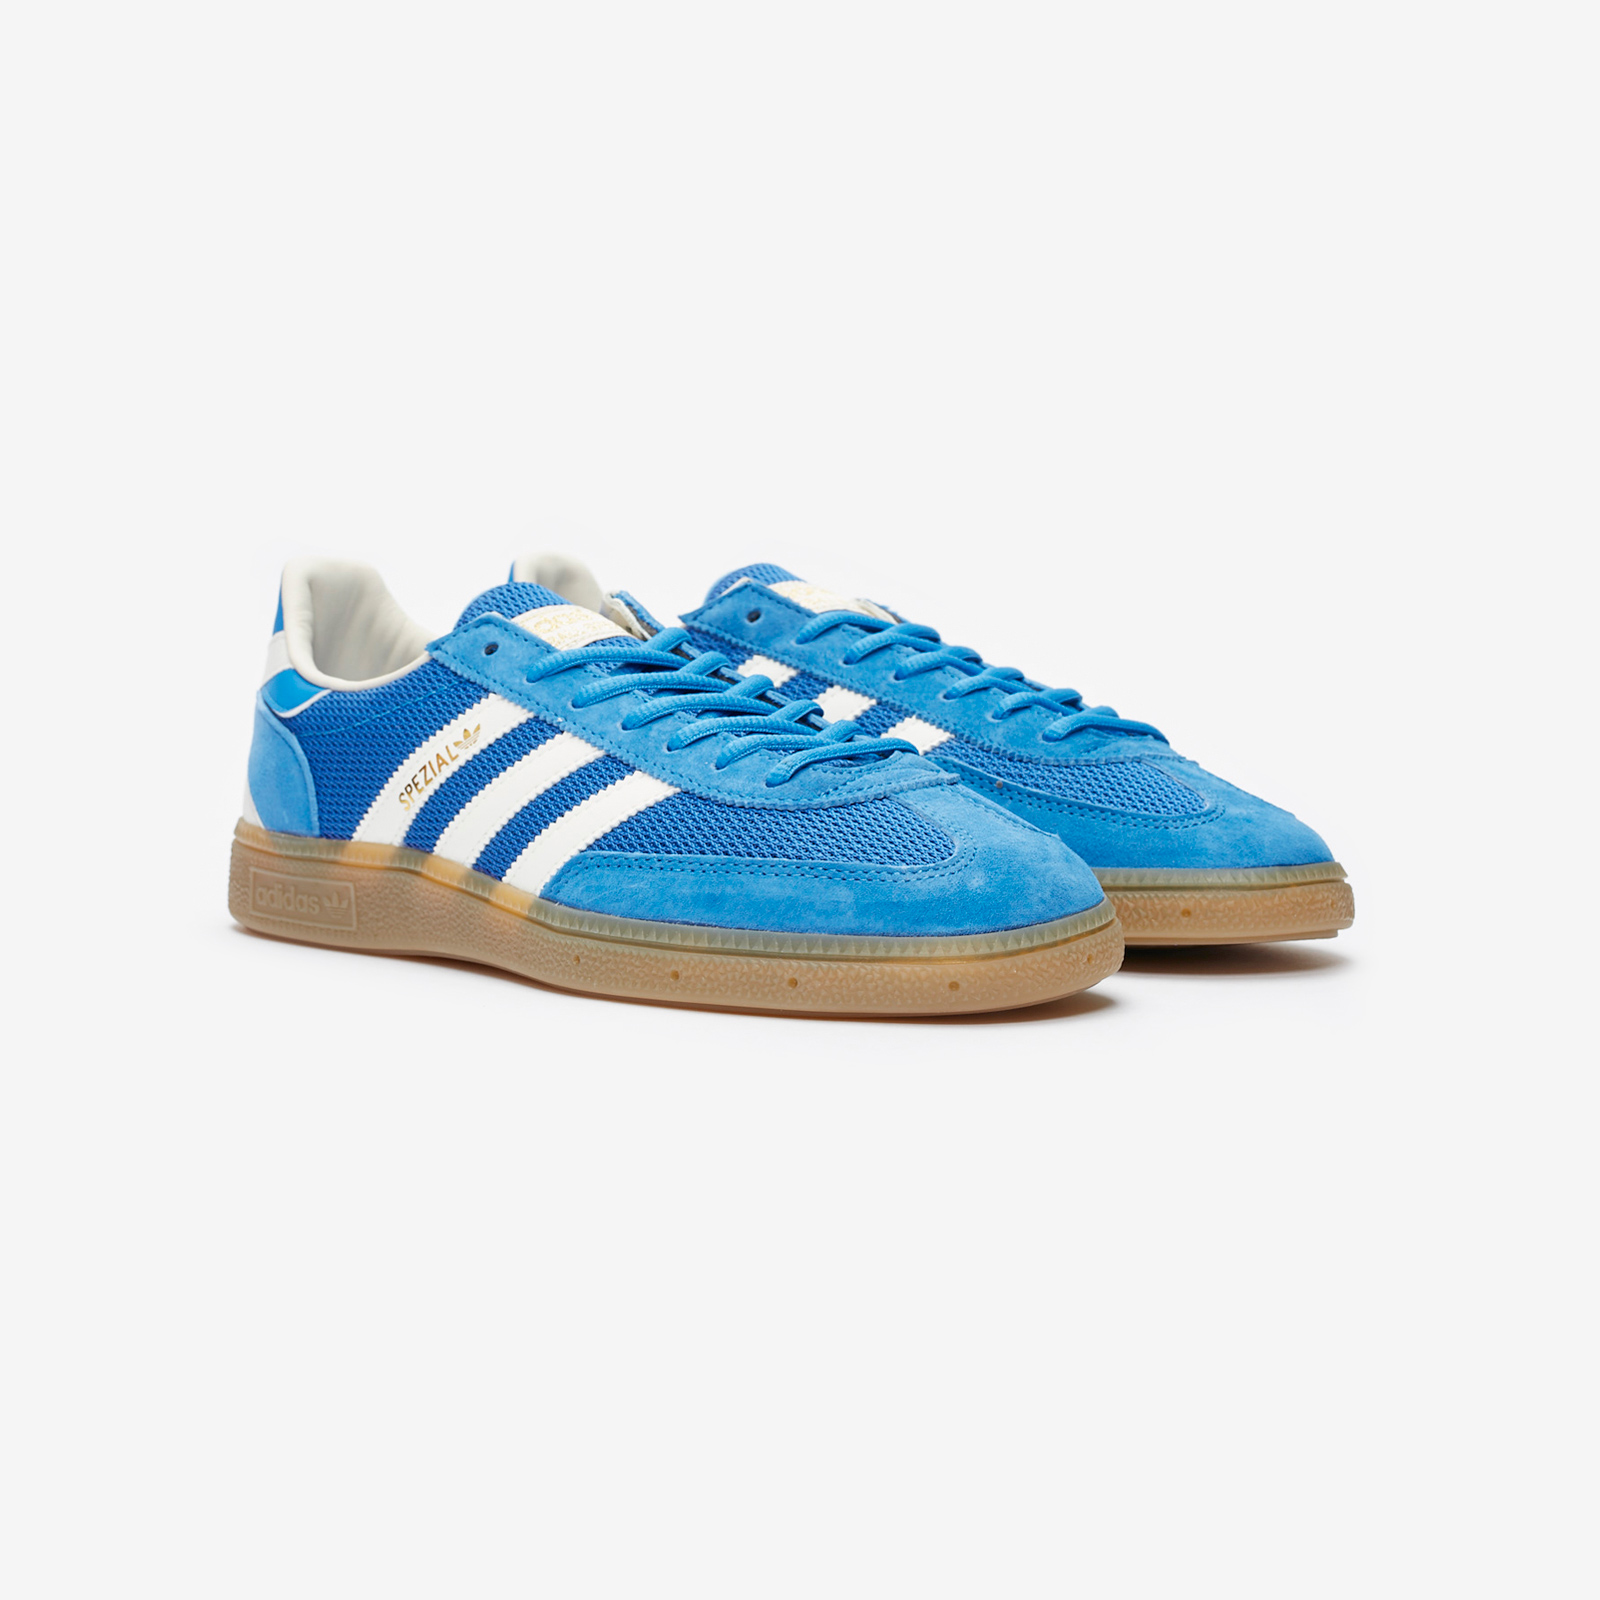 Adidas Originals Handball Spezial Color Orange Size 40 23